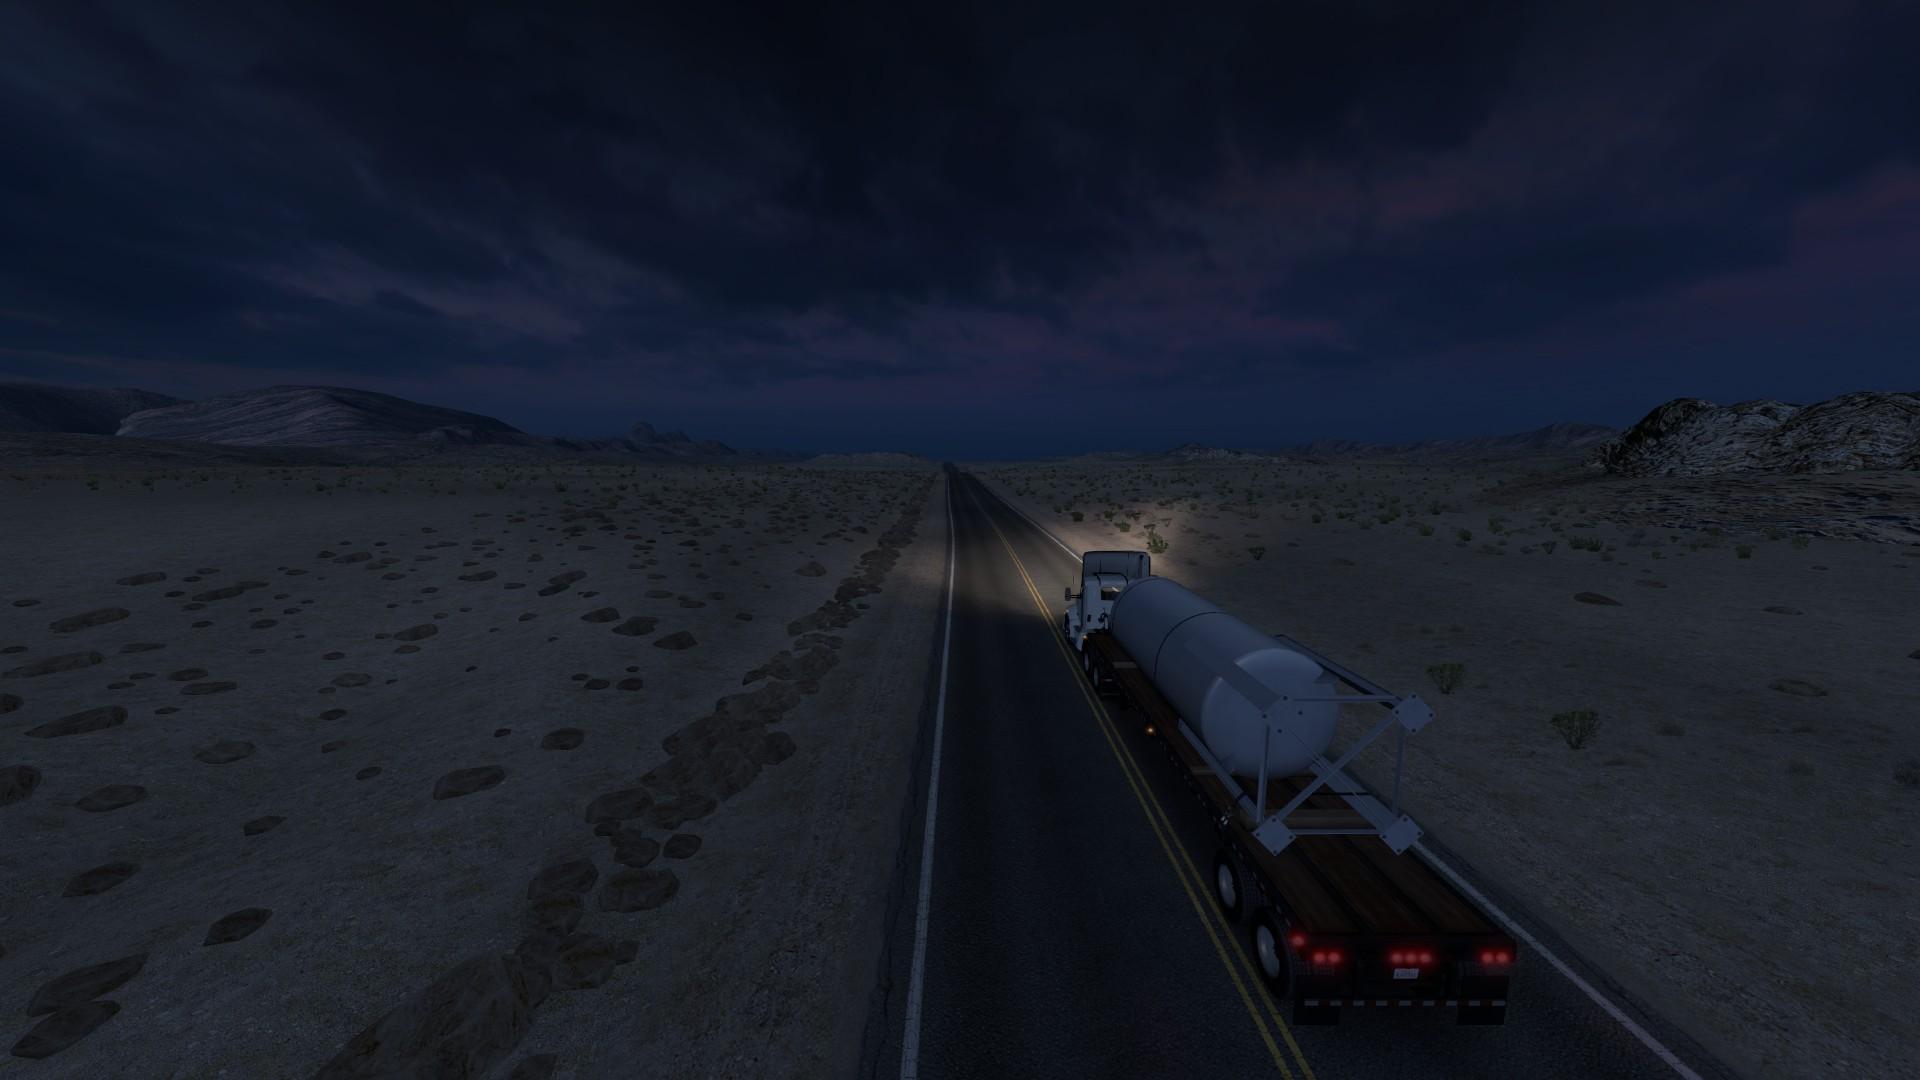 1920x1080 px American Truck Simulator ATS Kenworth Peterbilt trucks